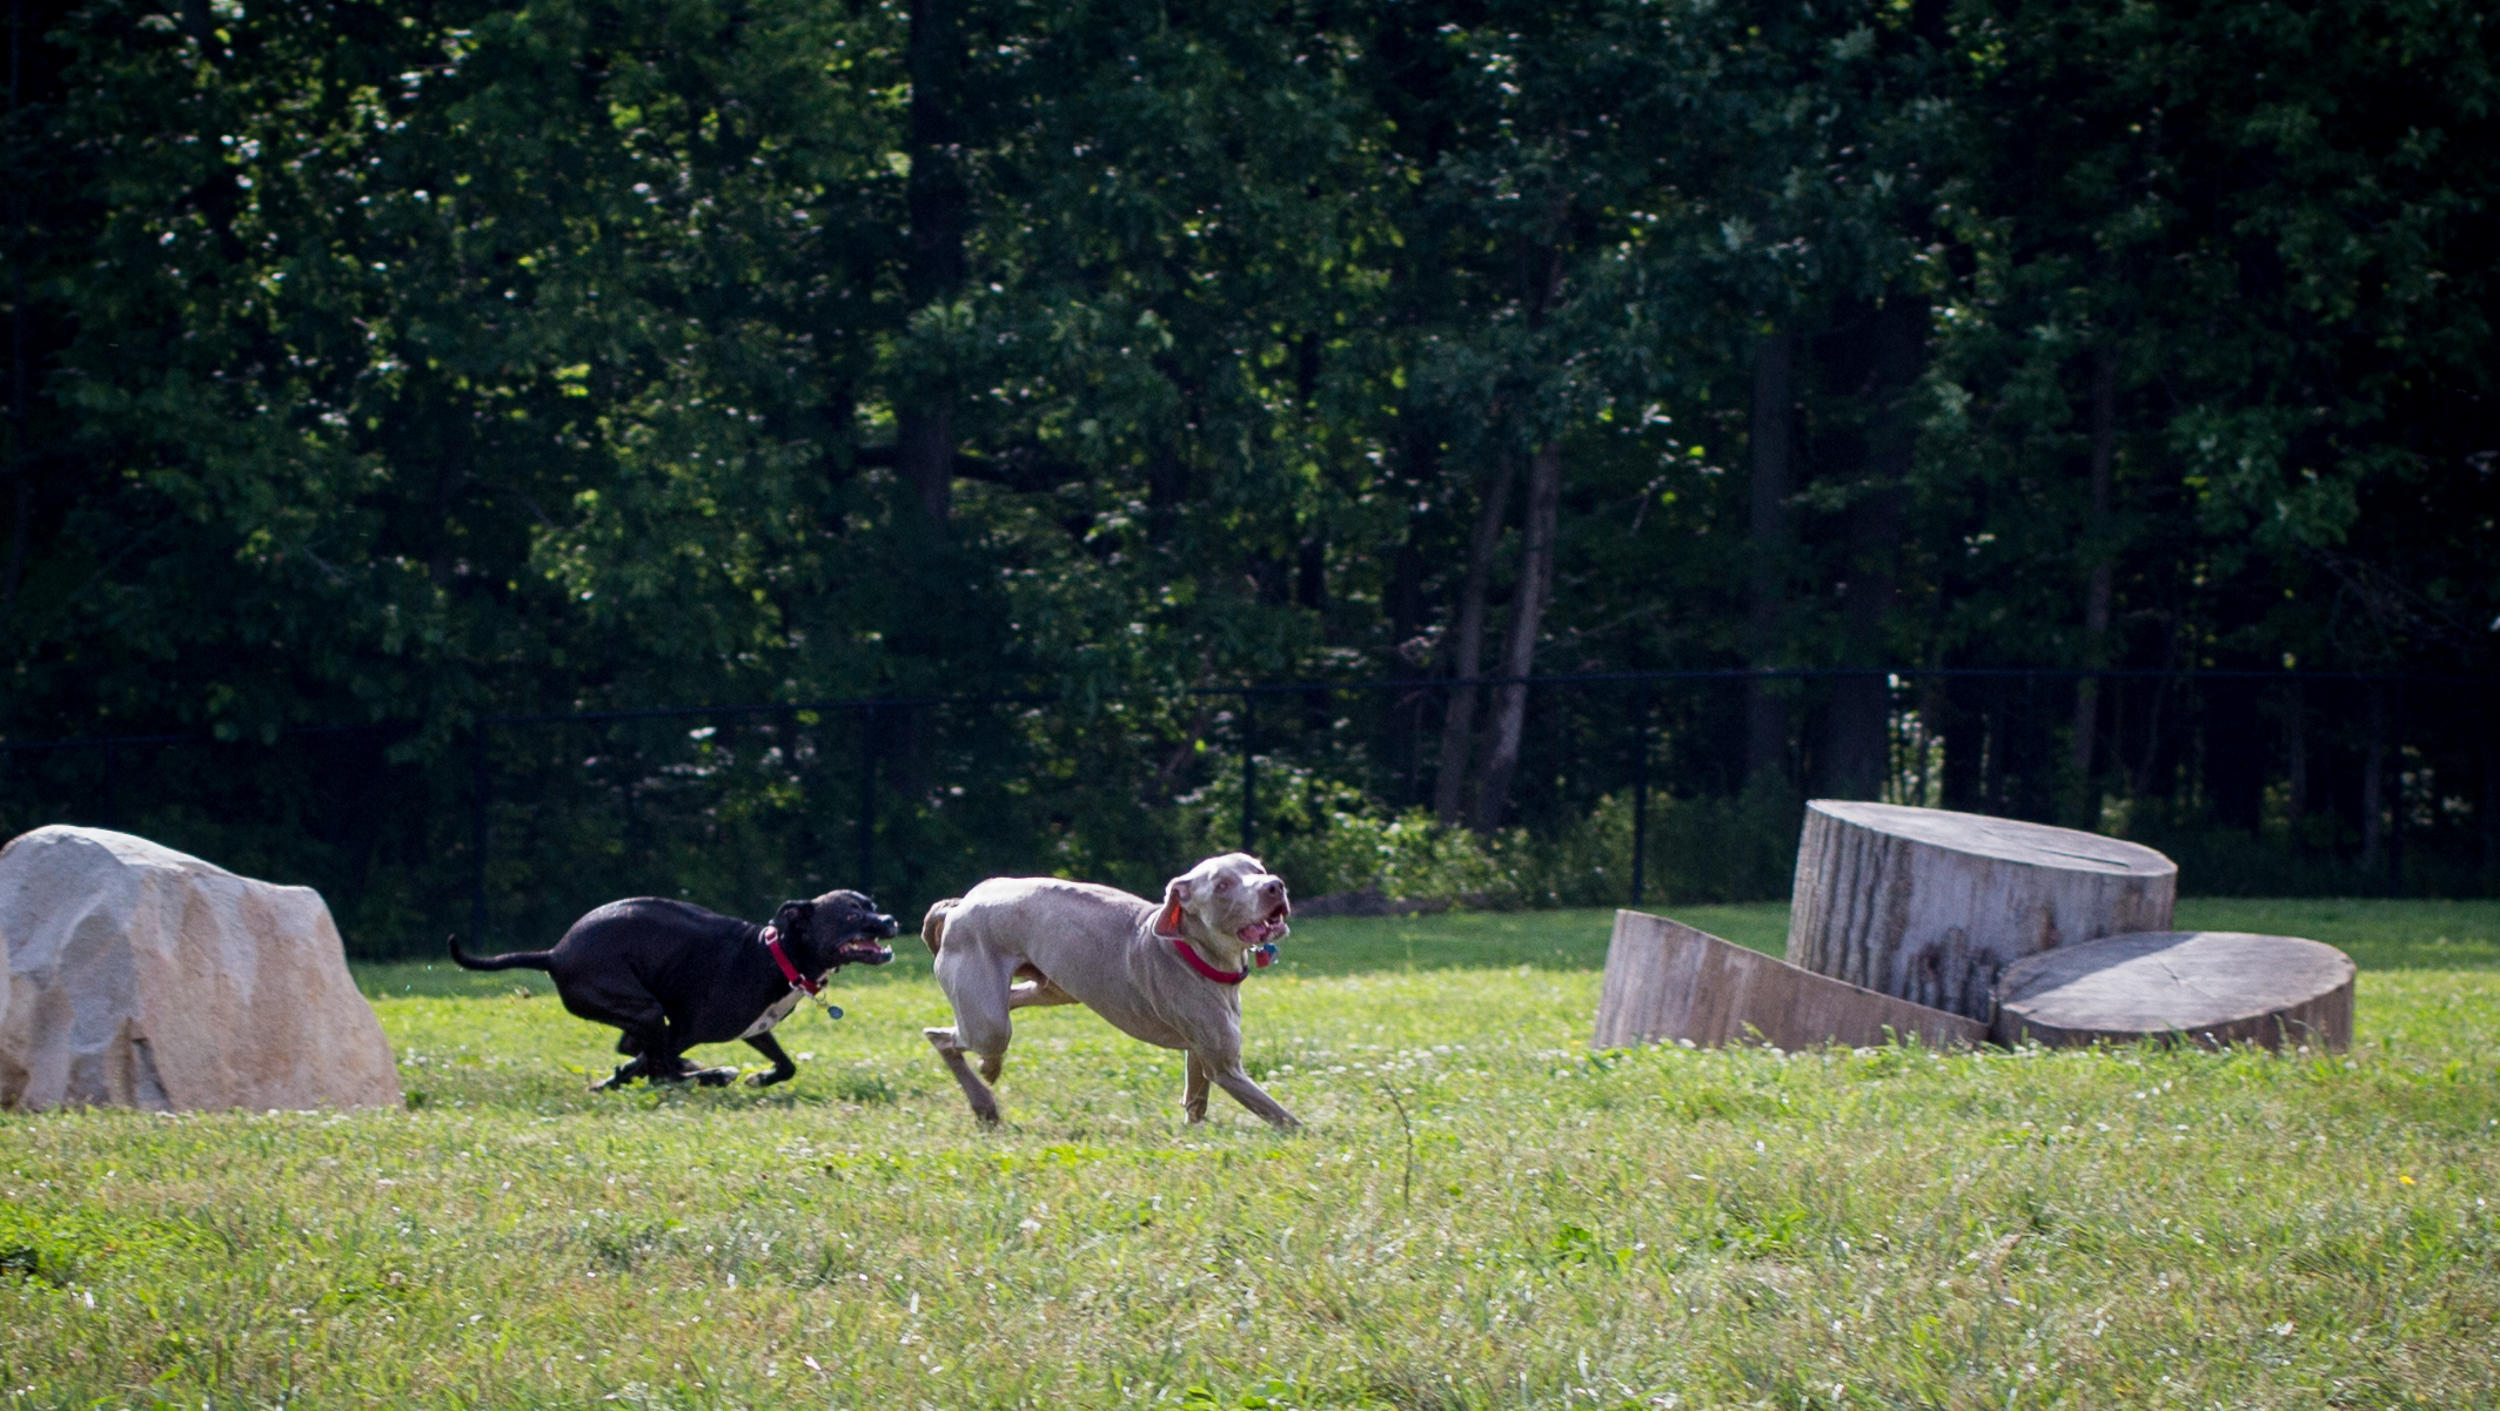 Lacey_dogpark_061817-3.jpg